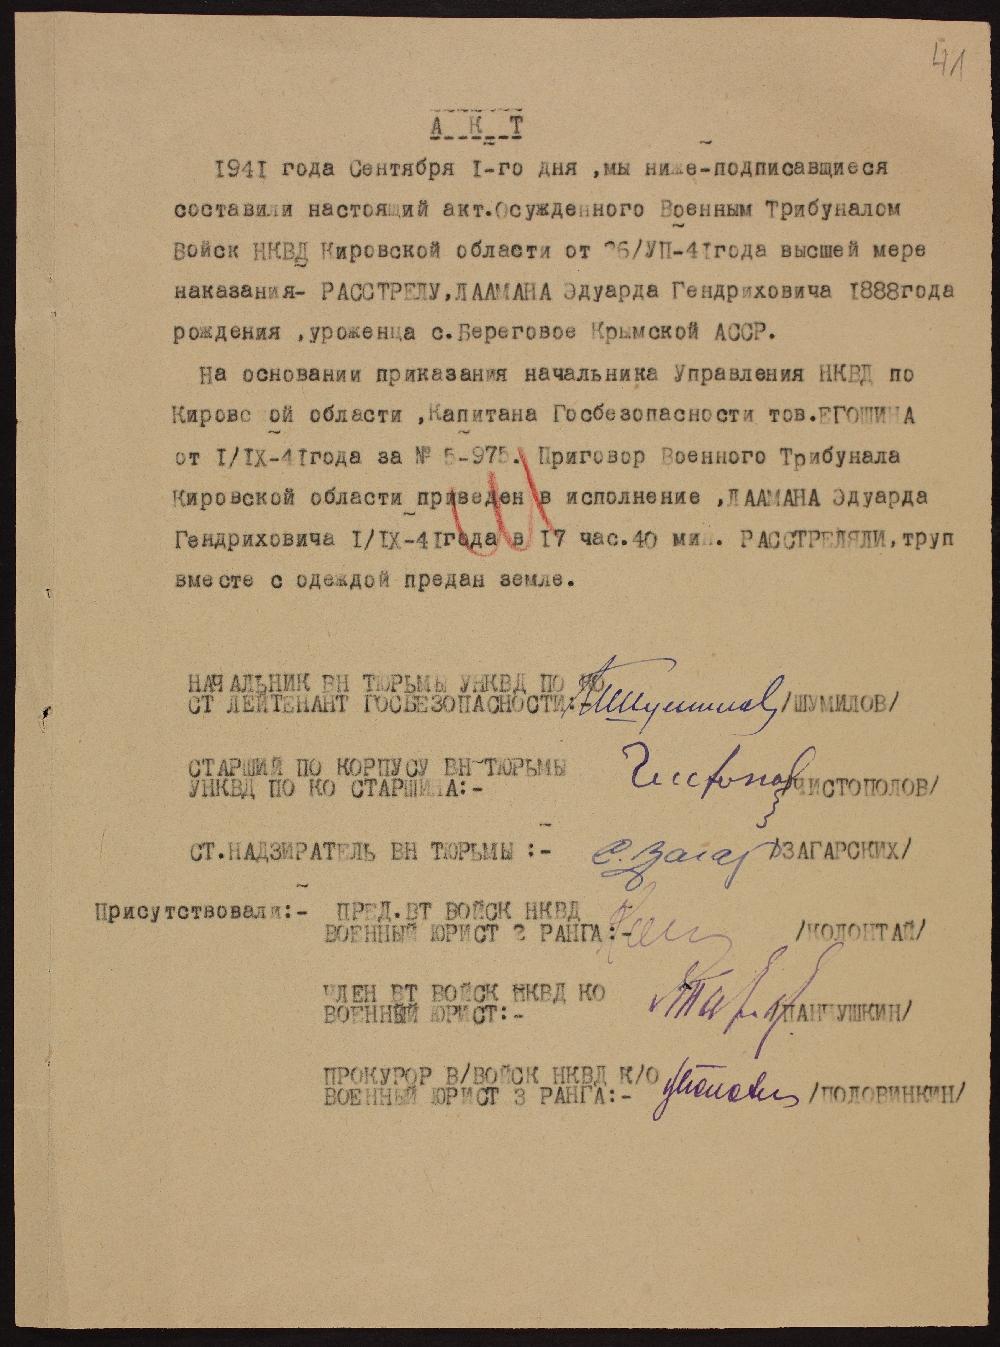 Akt 1941. erf129sm_001_2238-0-3_00001_t